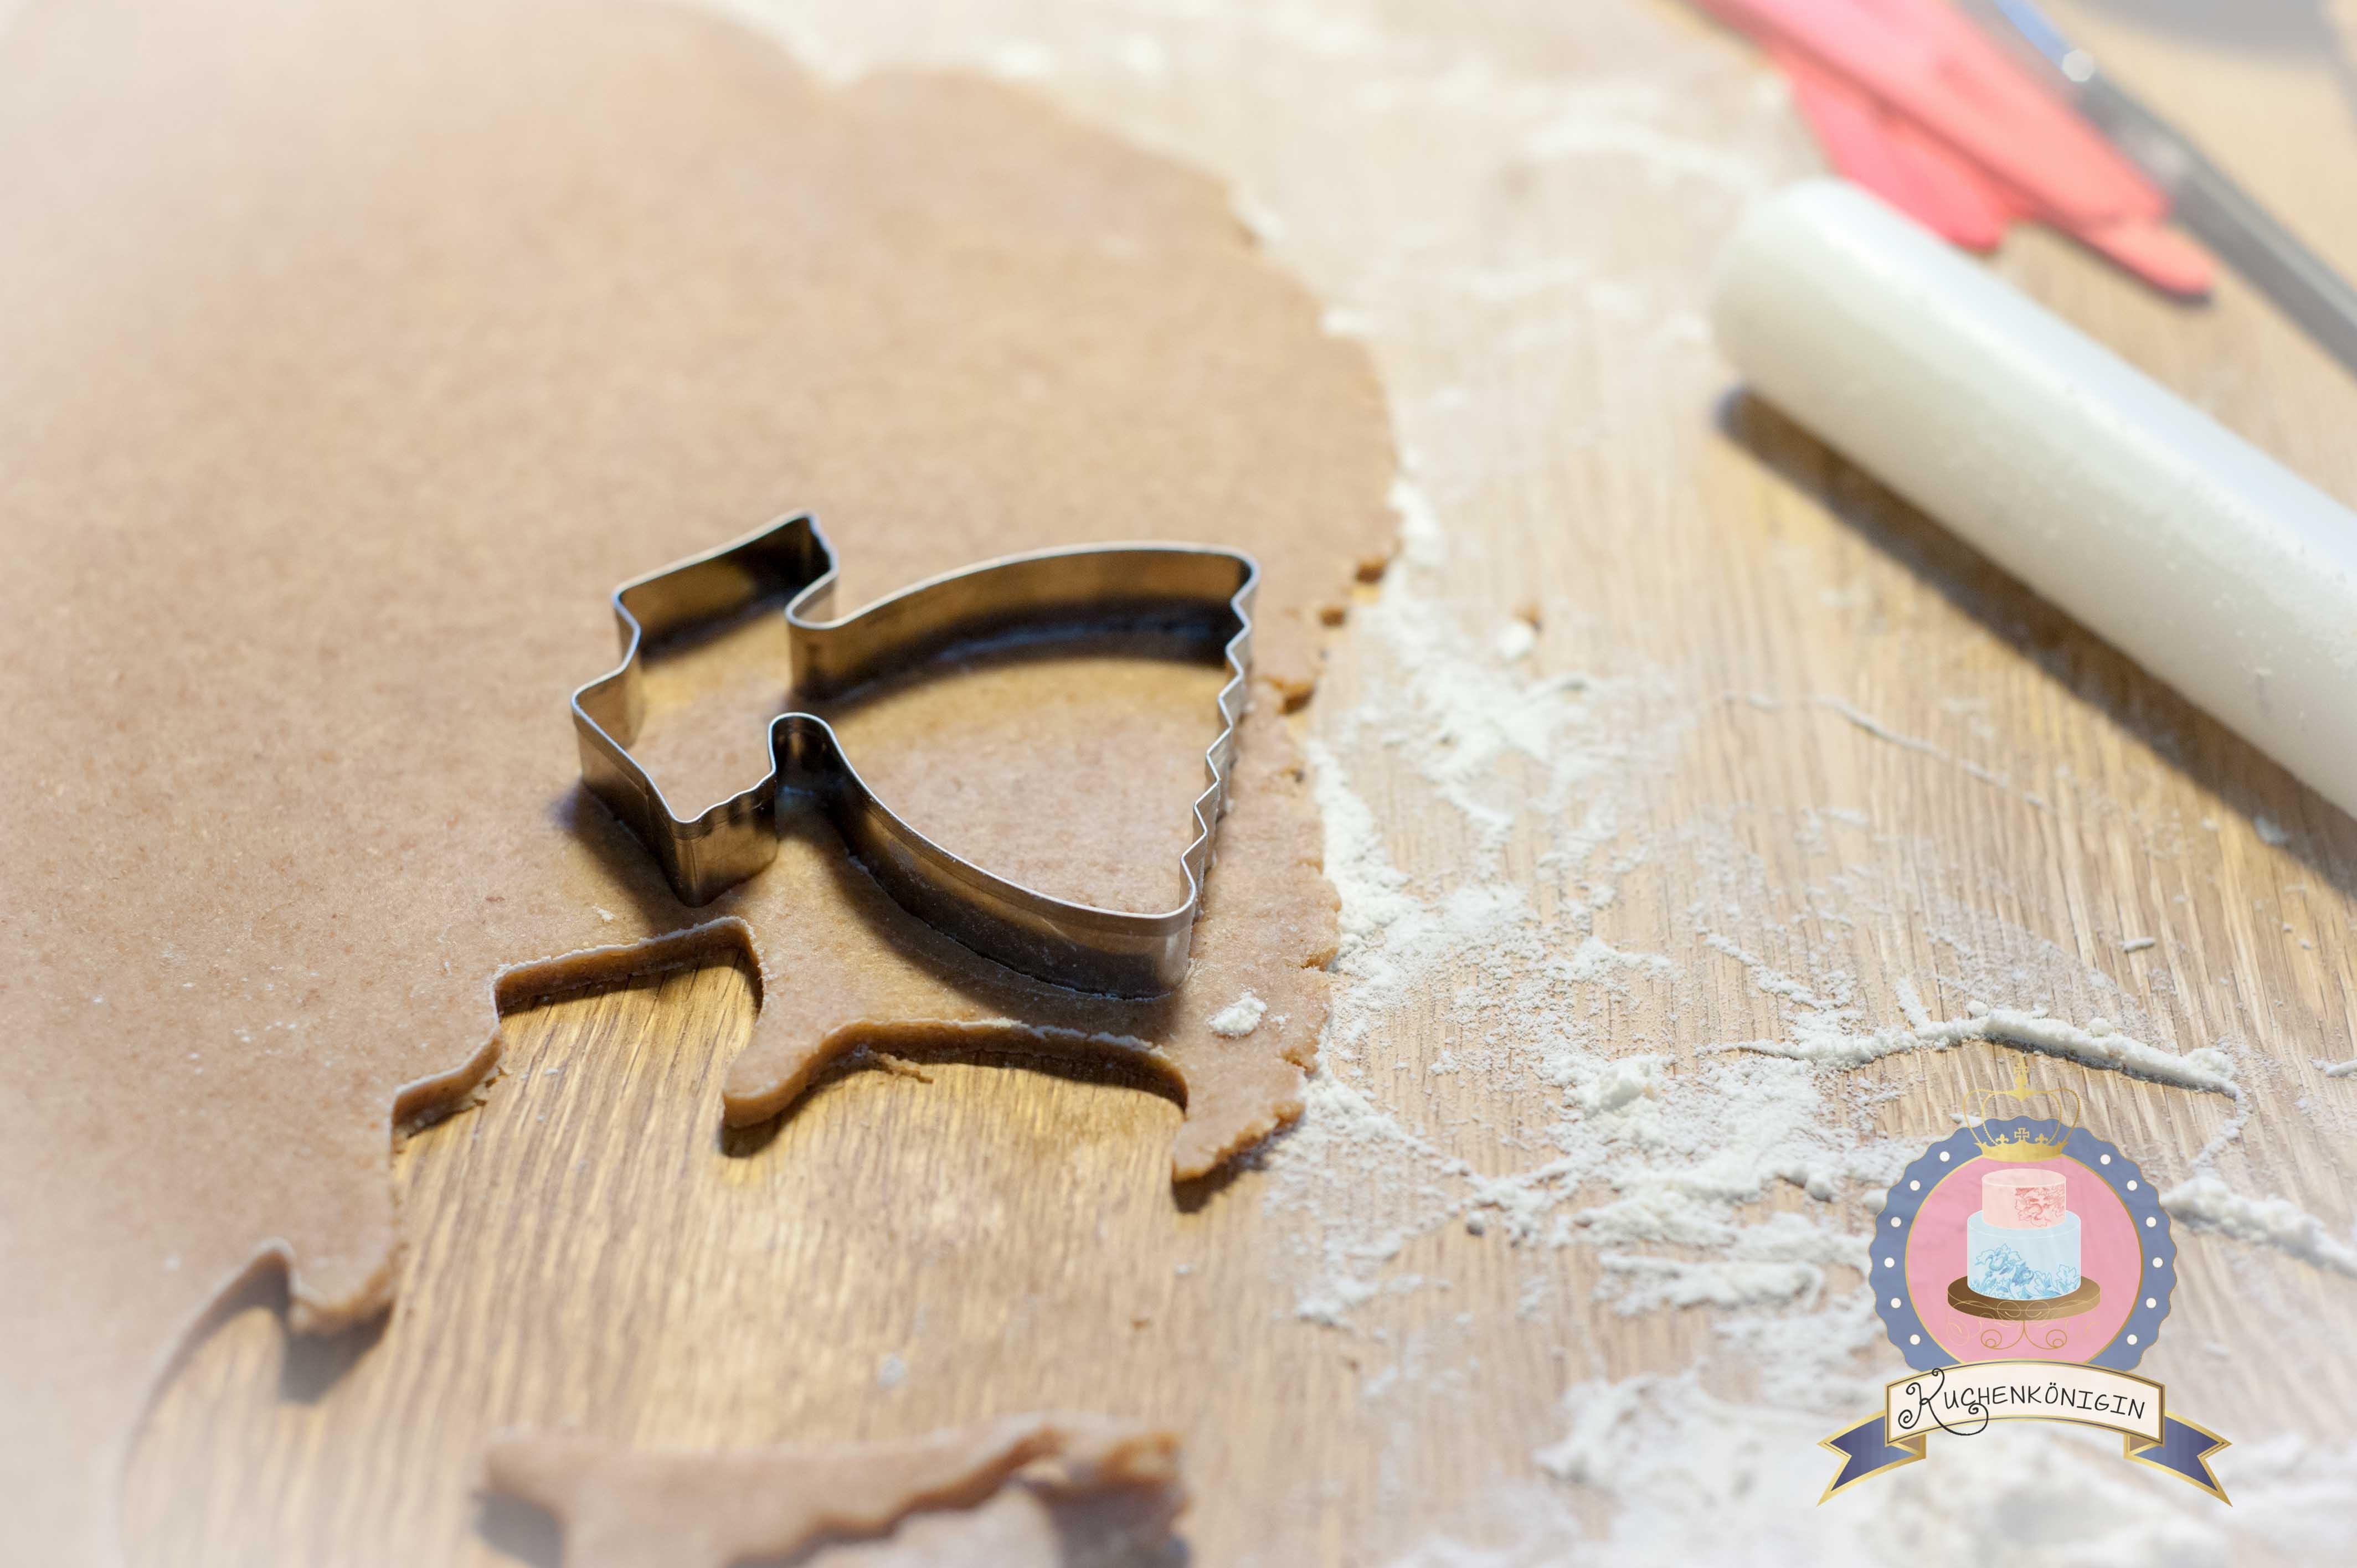 Kuchenkönigin Bio Dinkel Vollkorn Feigen Kekspops Kekse am Stil Cookies Rezept Tutorial Backen